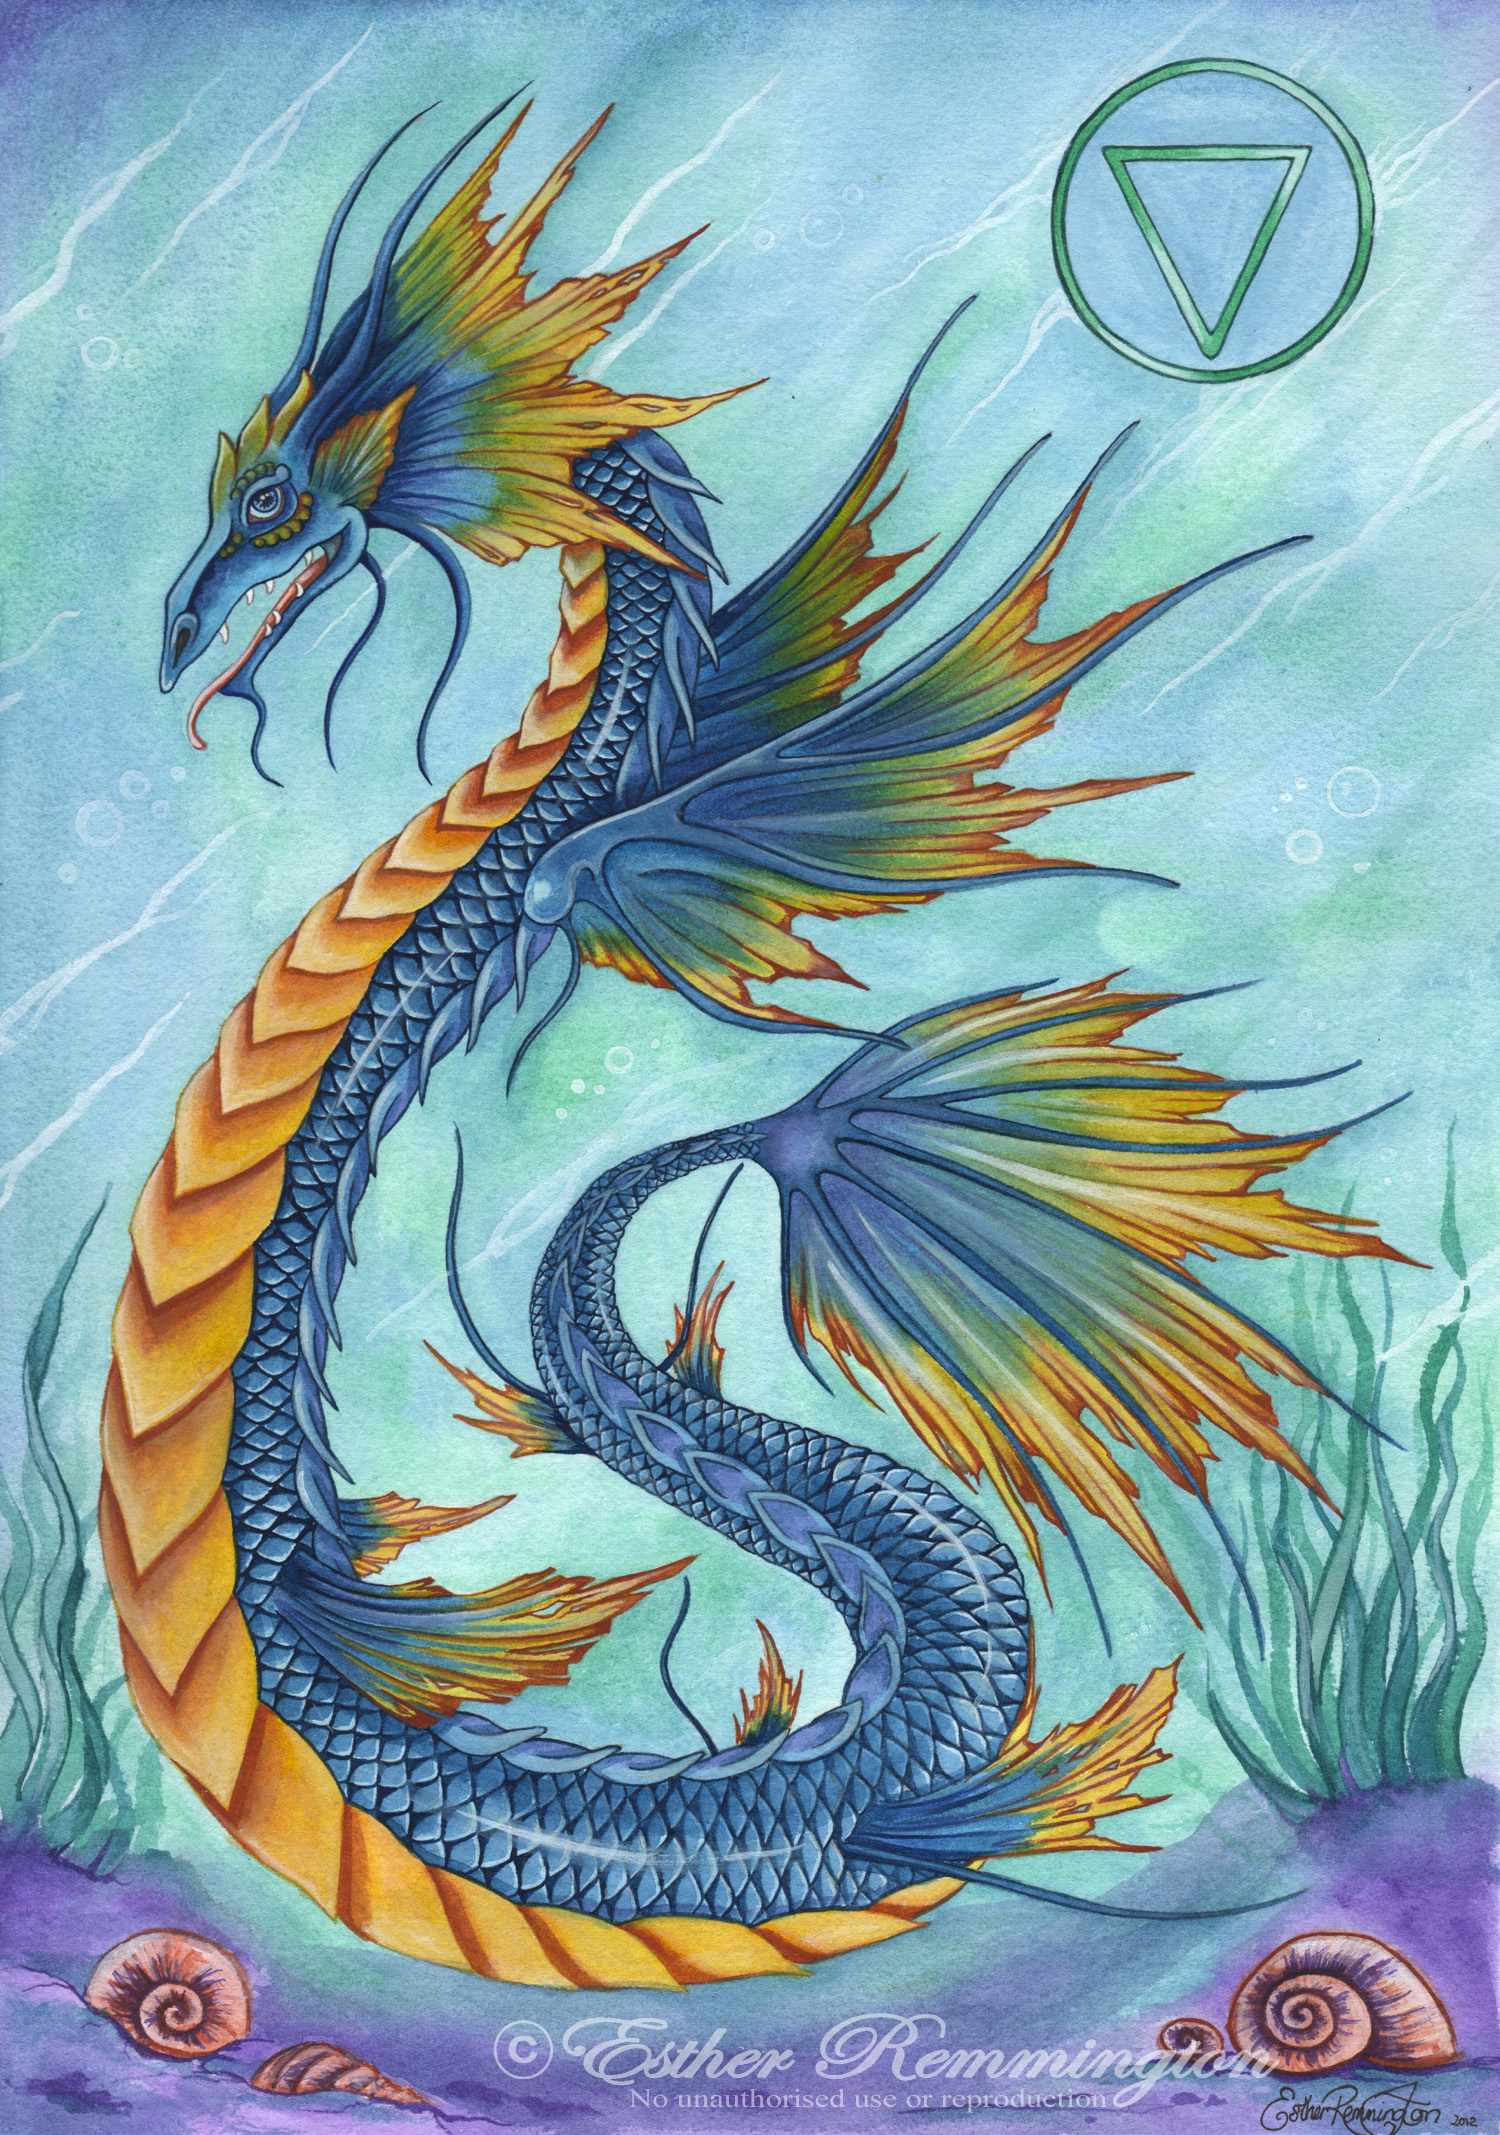 Water Dragon - 2012